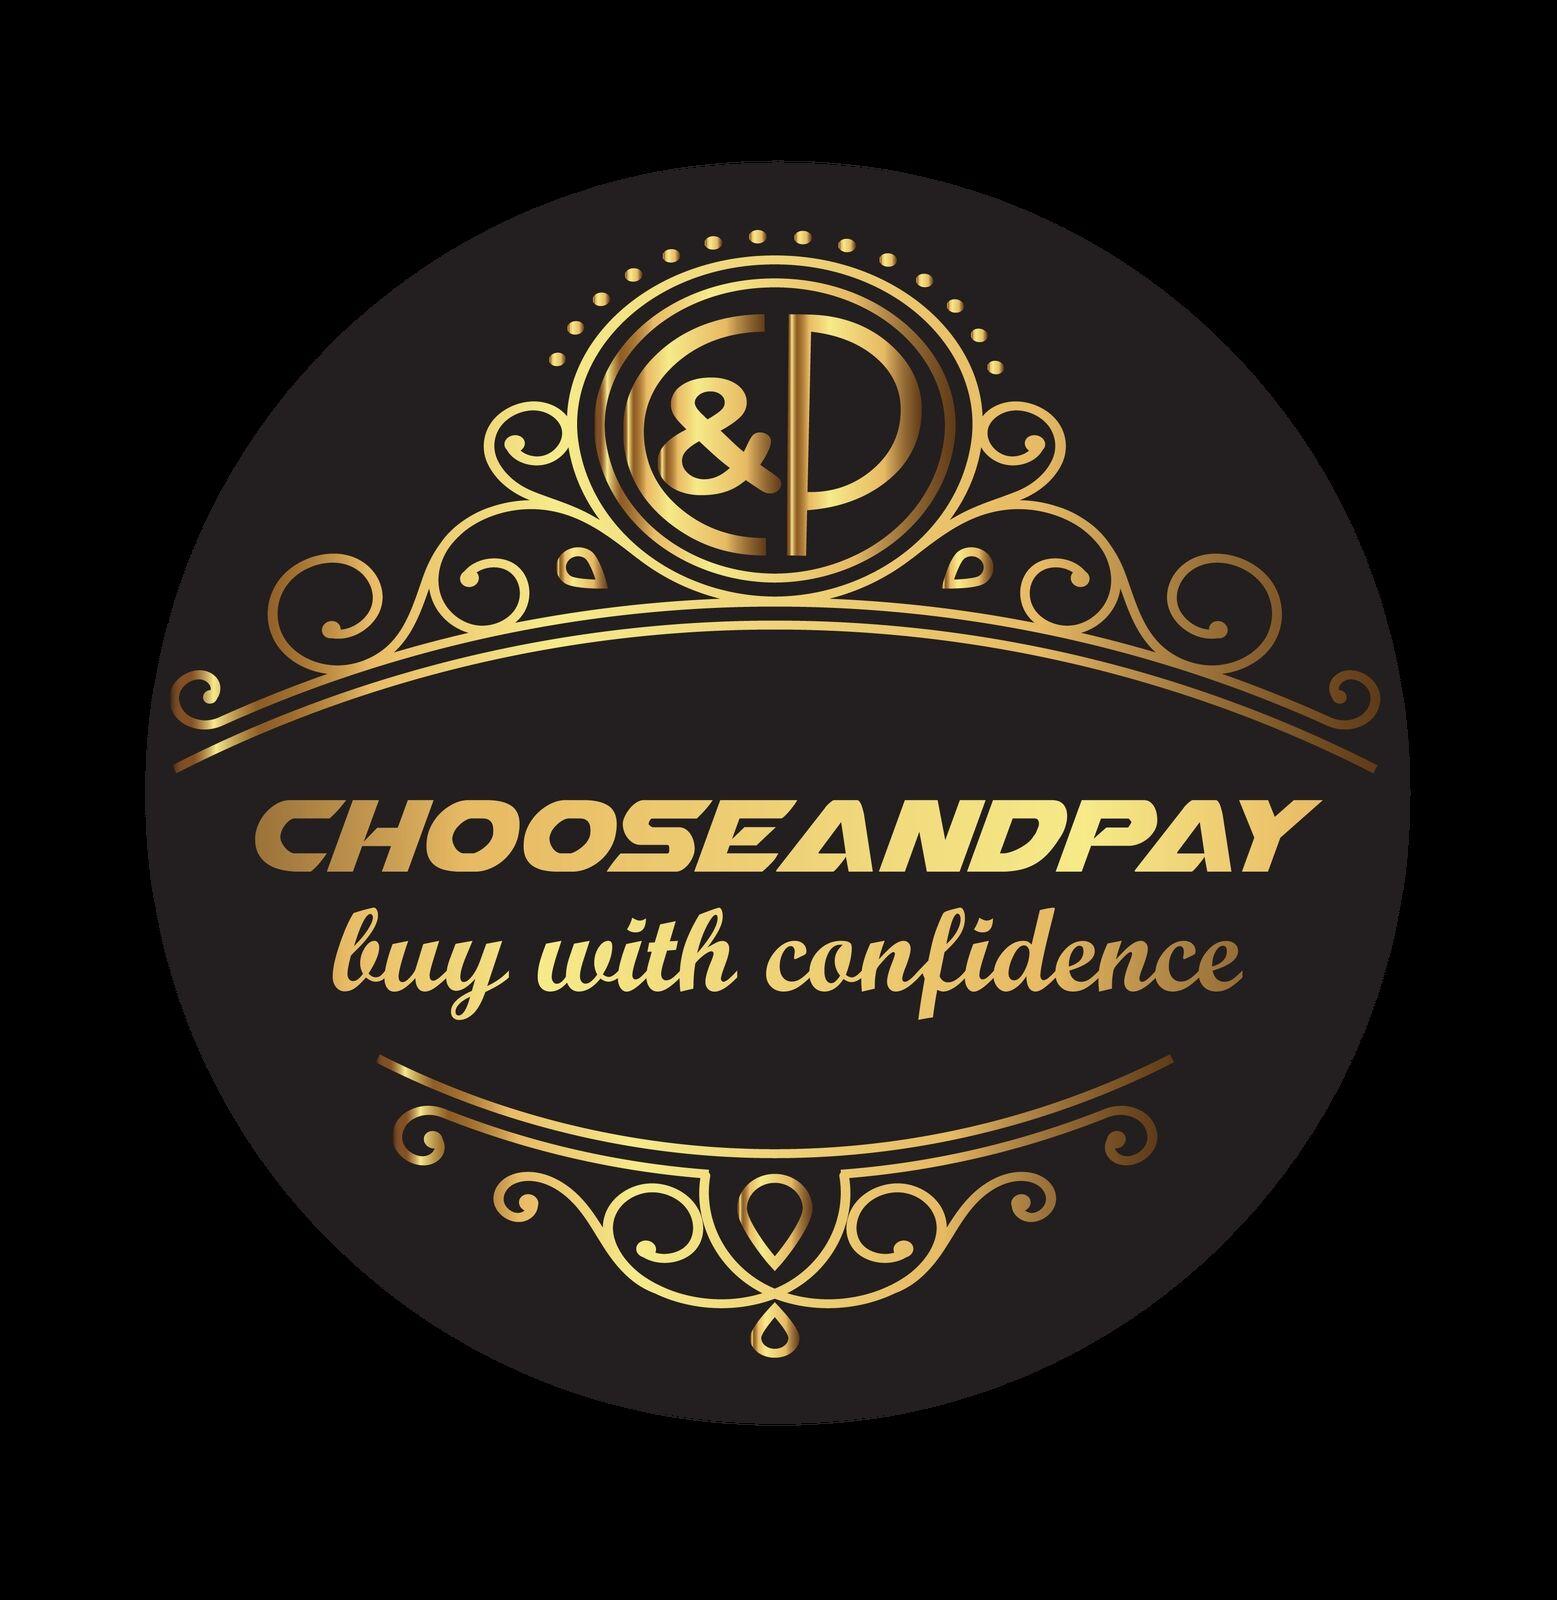 chooseandpay-ltd